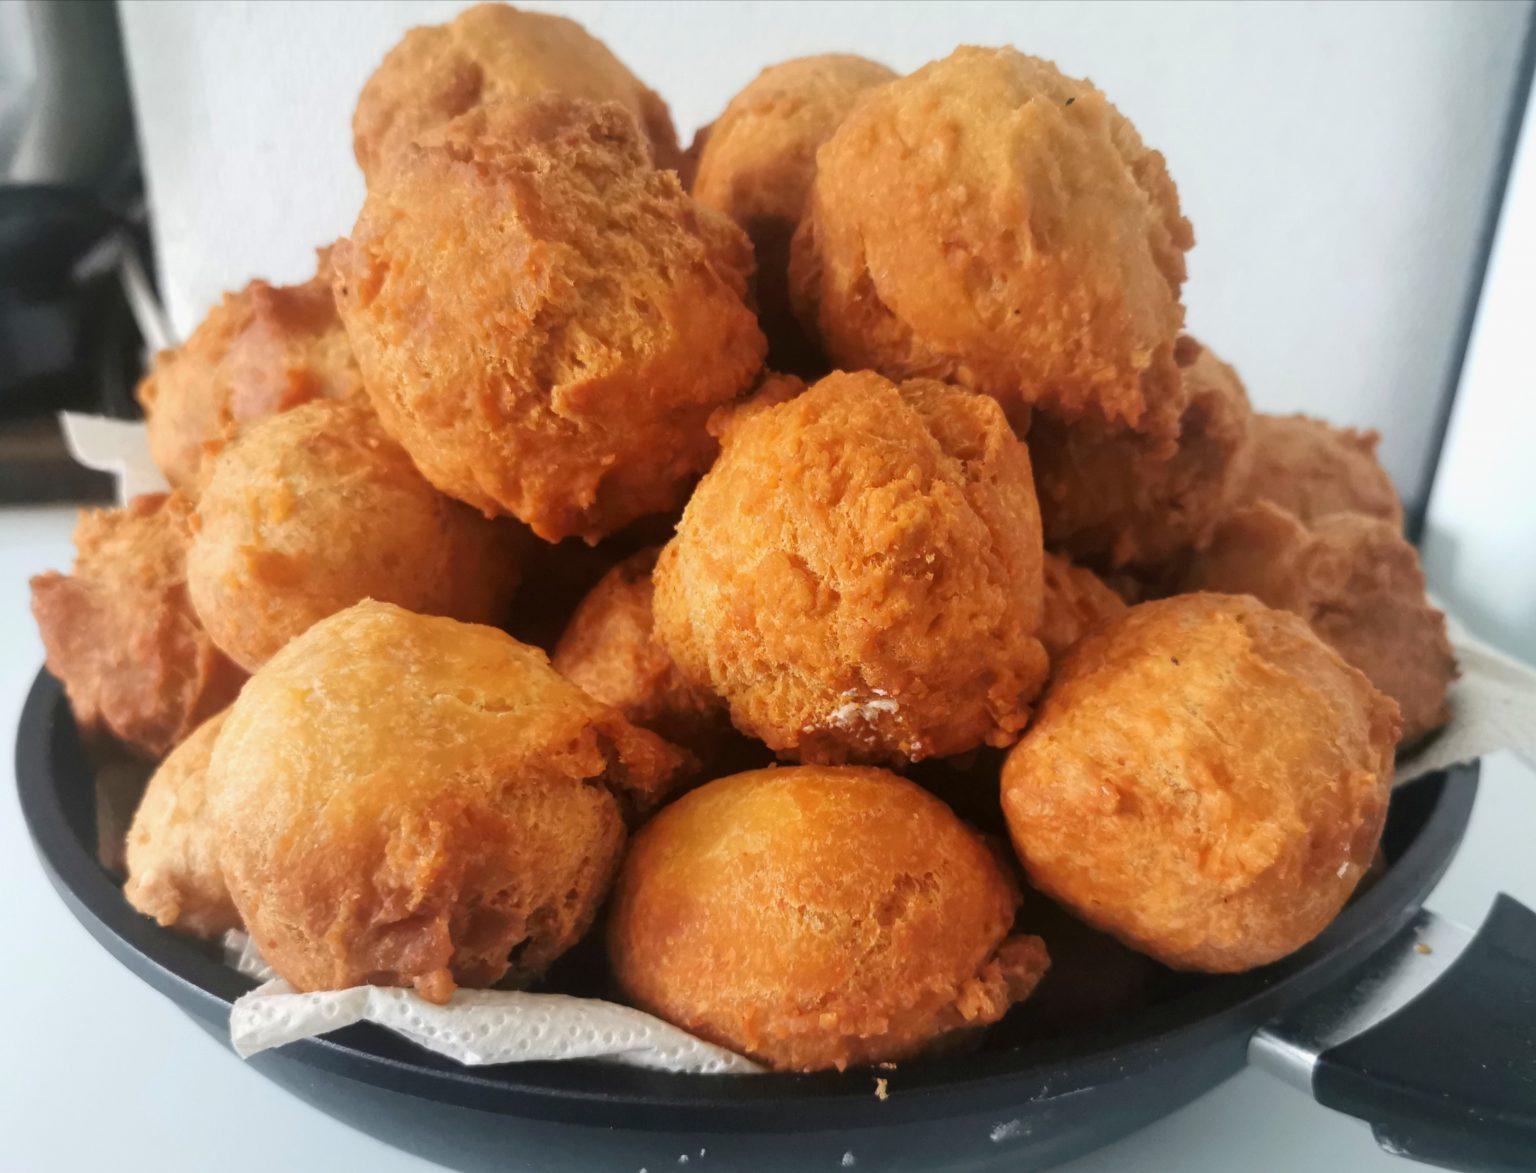 20 delicious nigerian food recipes | faith fitness food